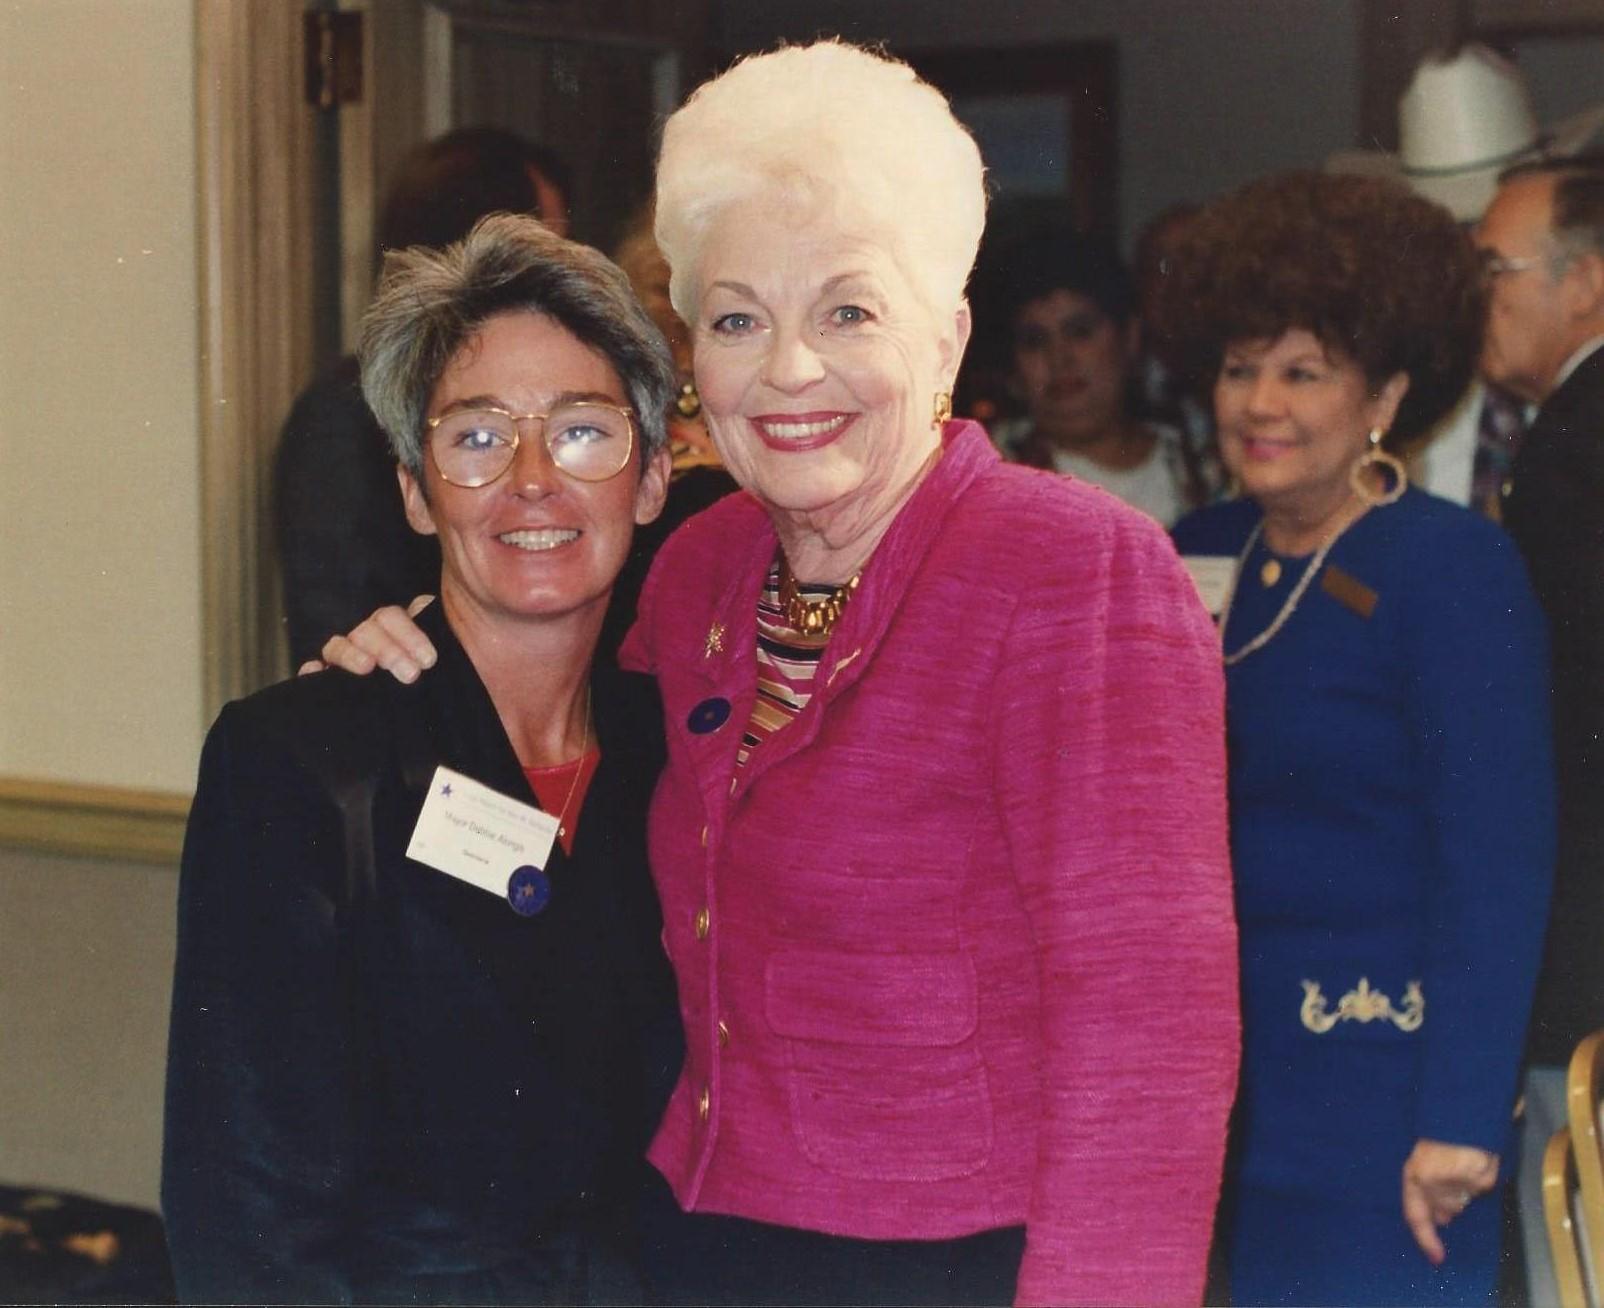 Debbie Alongis and Ann RIchards